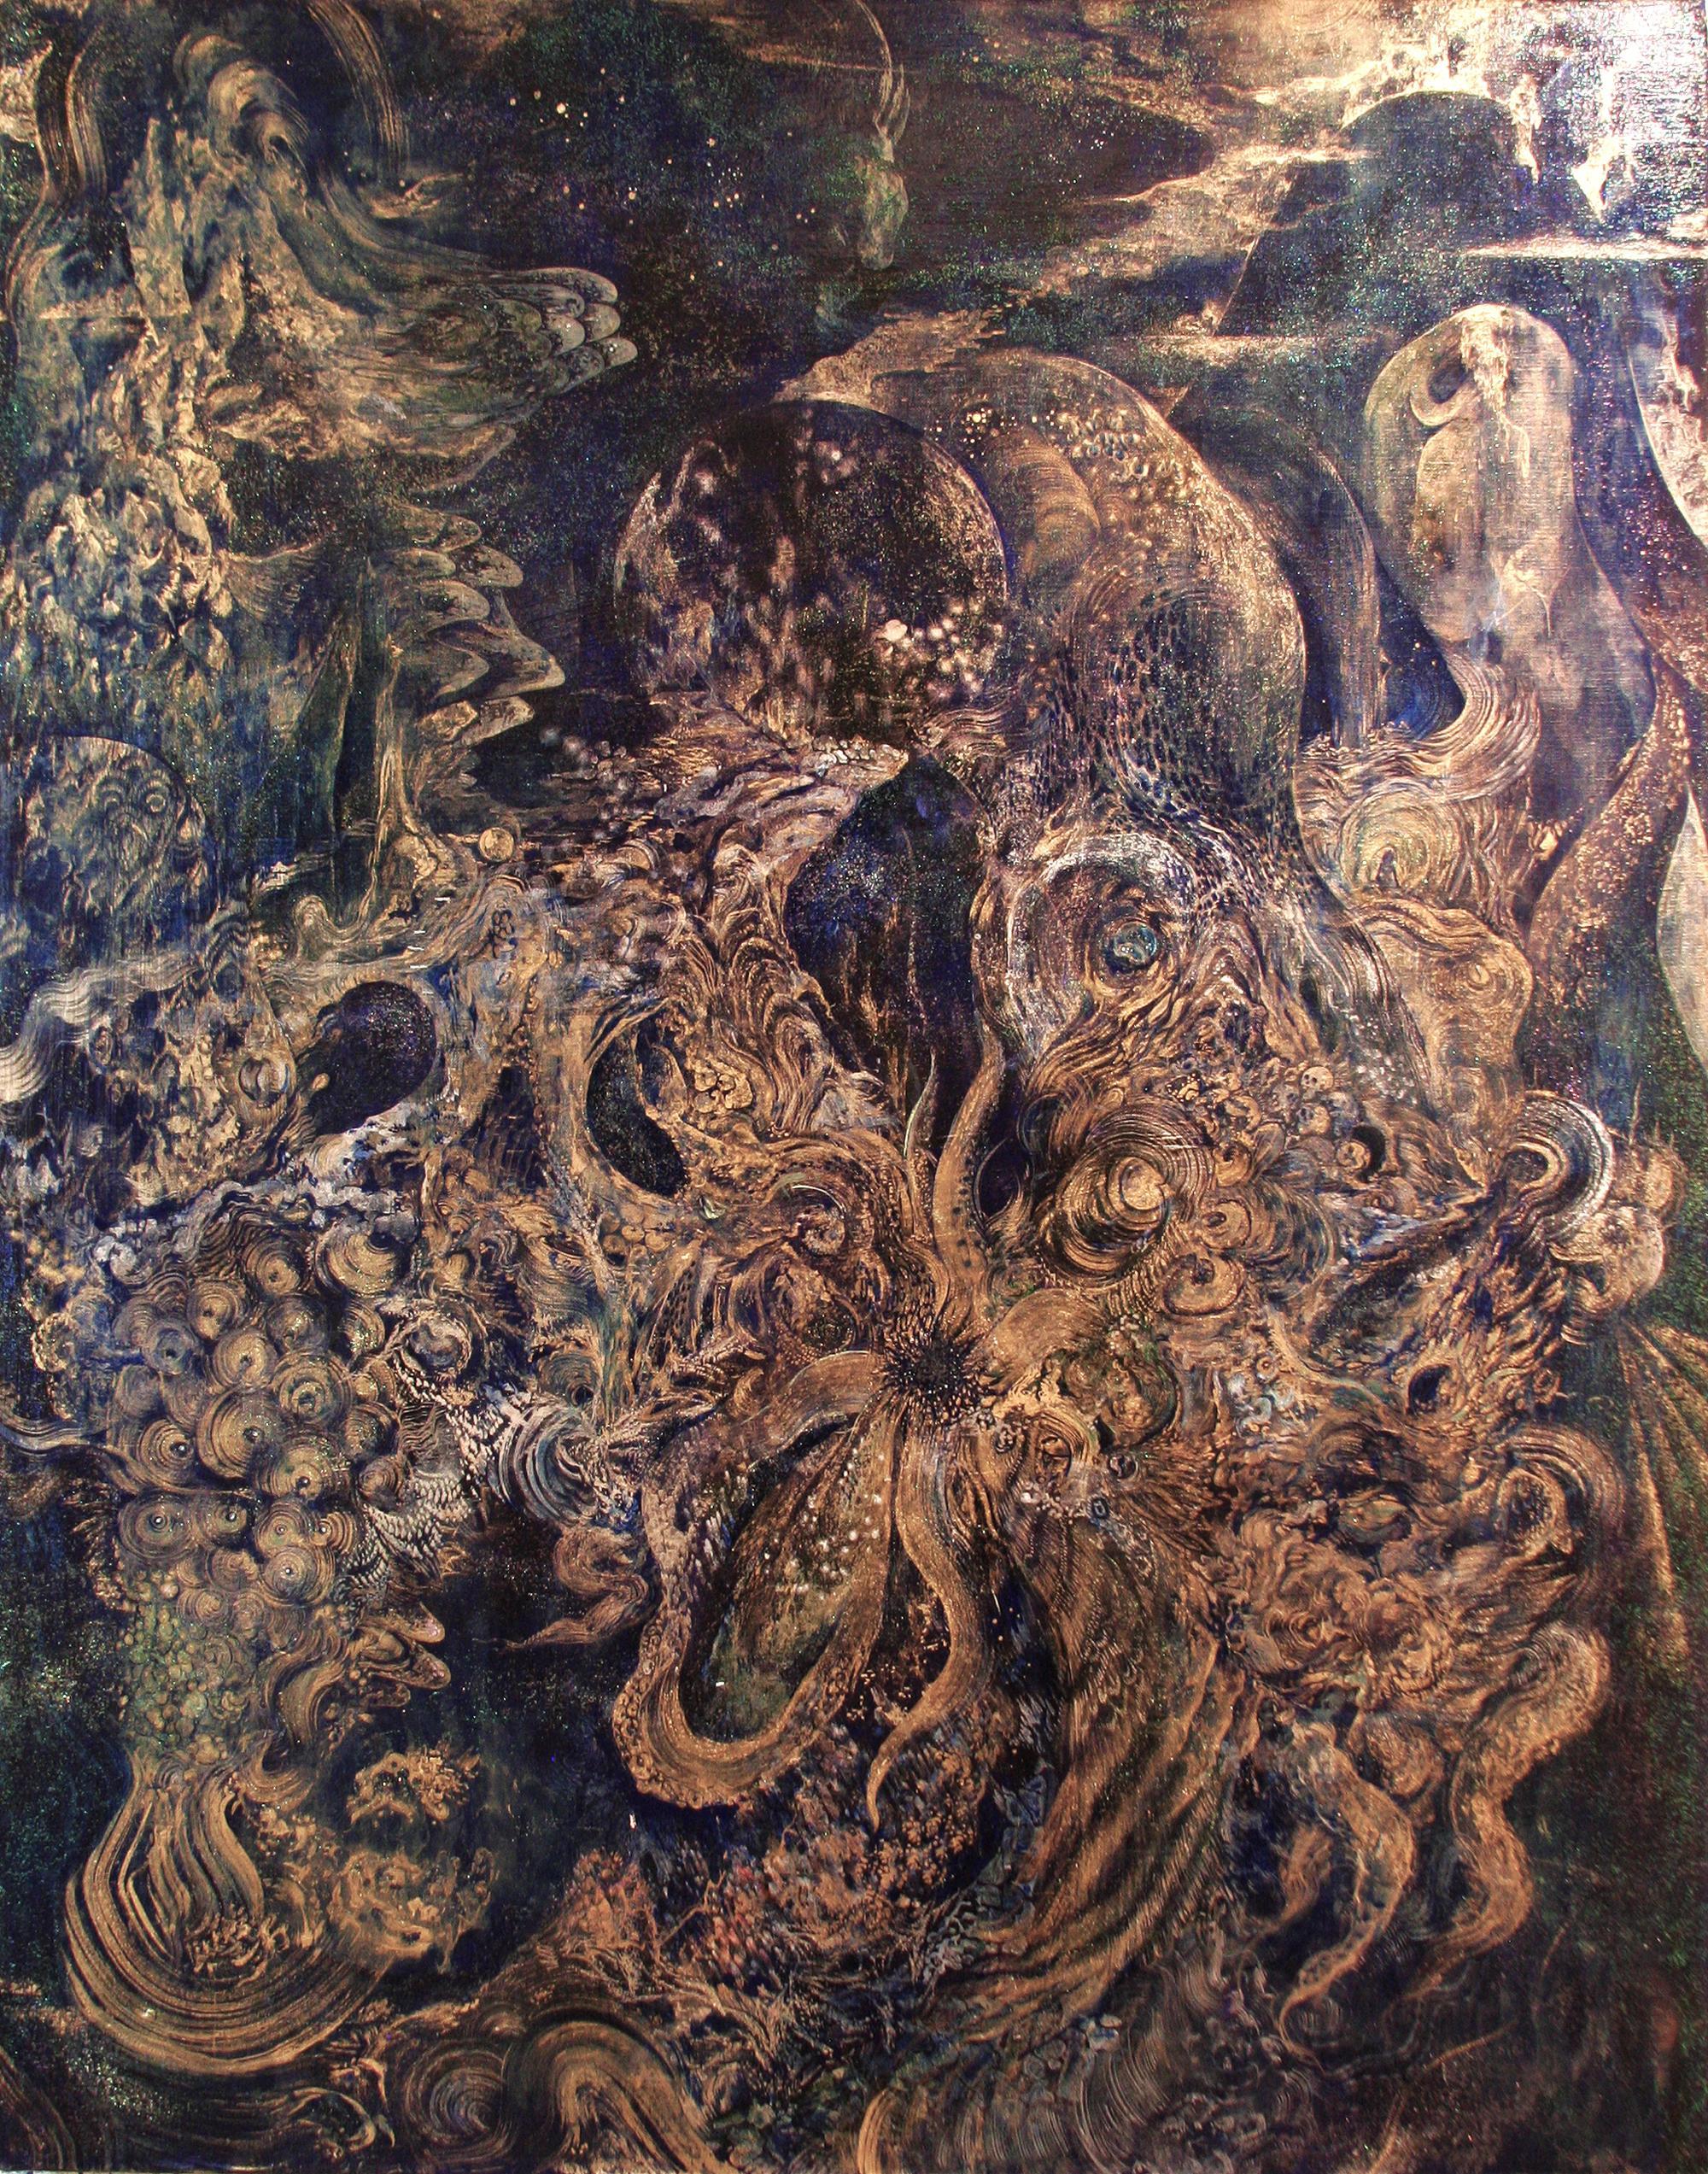 Cephalopod in the deep sea  2014  Acrylic and Metal powder on canvas  W100cm x H80.3cm